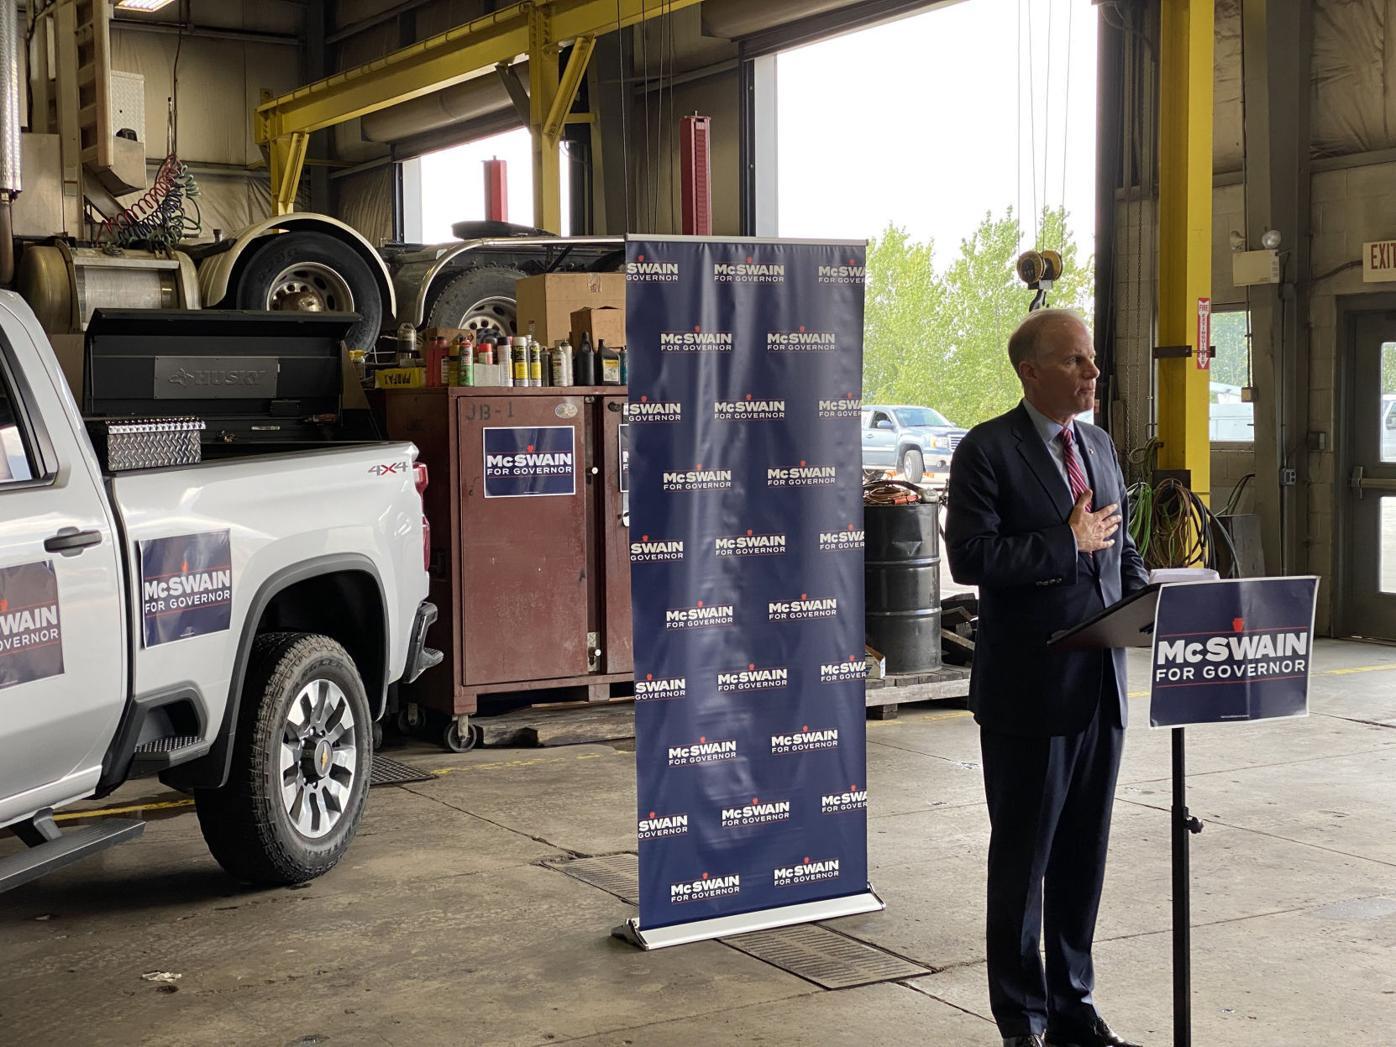 McSwain visits NEPA as bid for governor begins